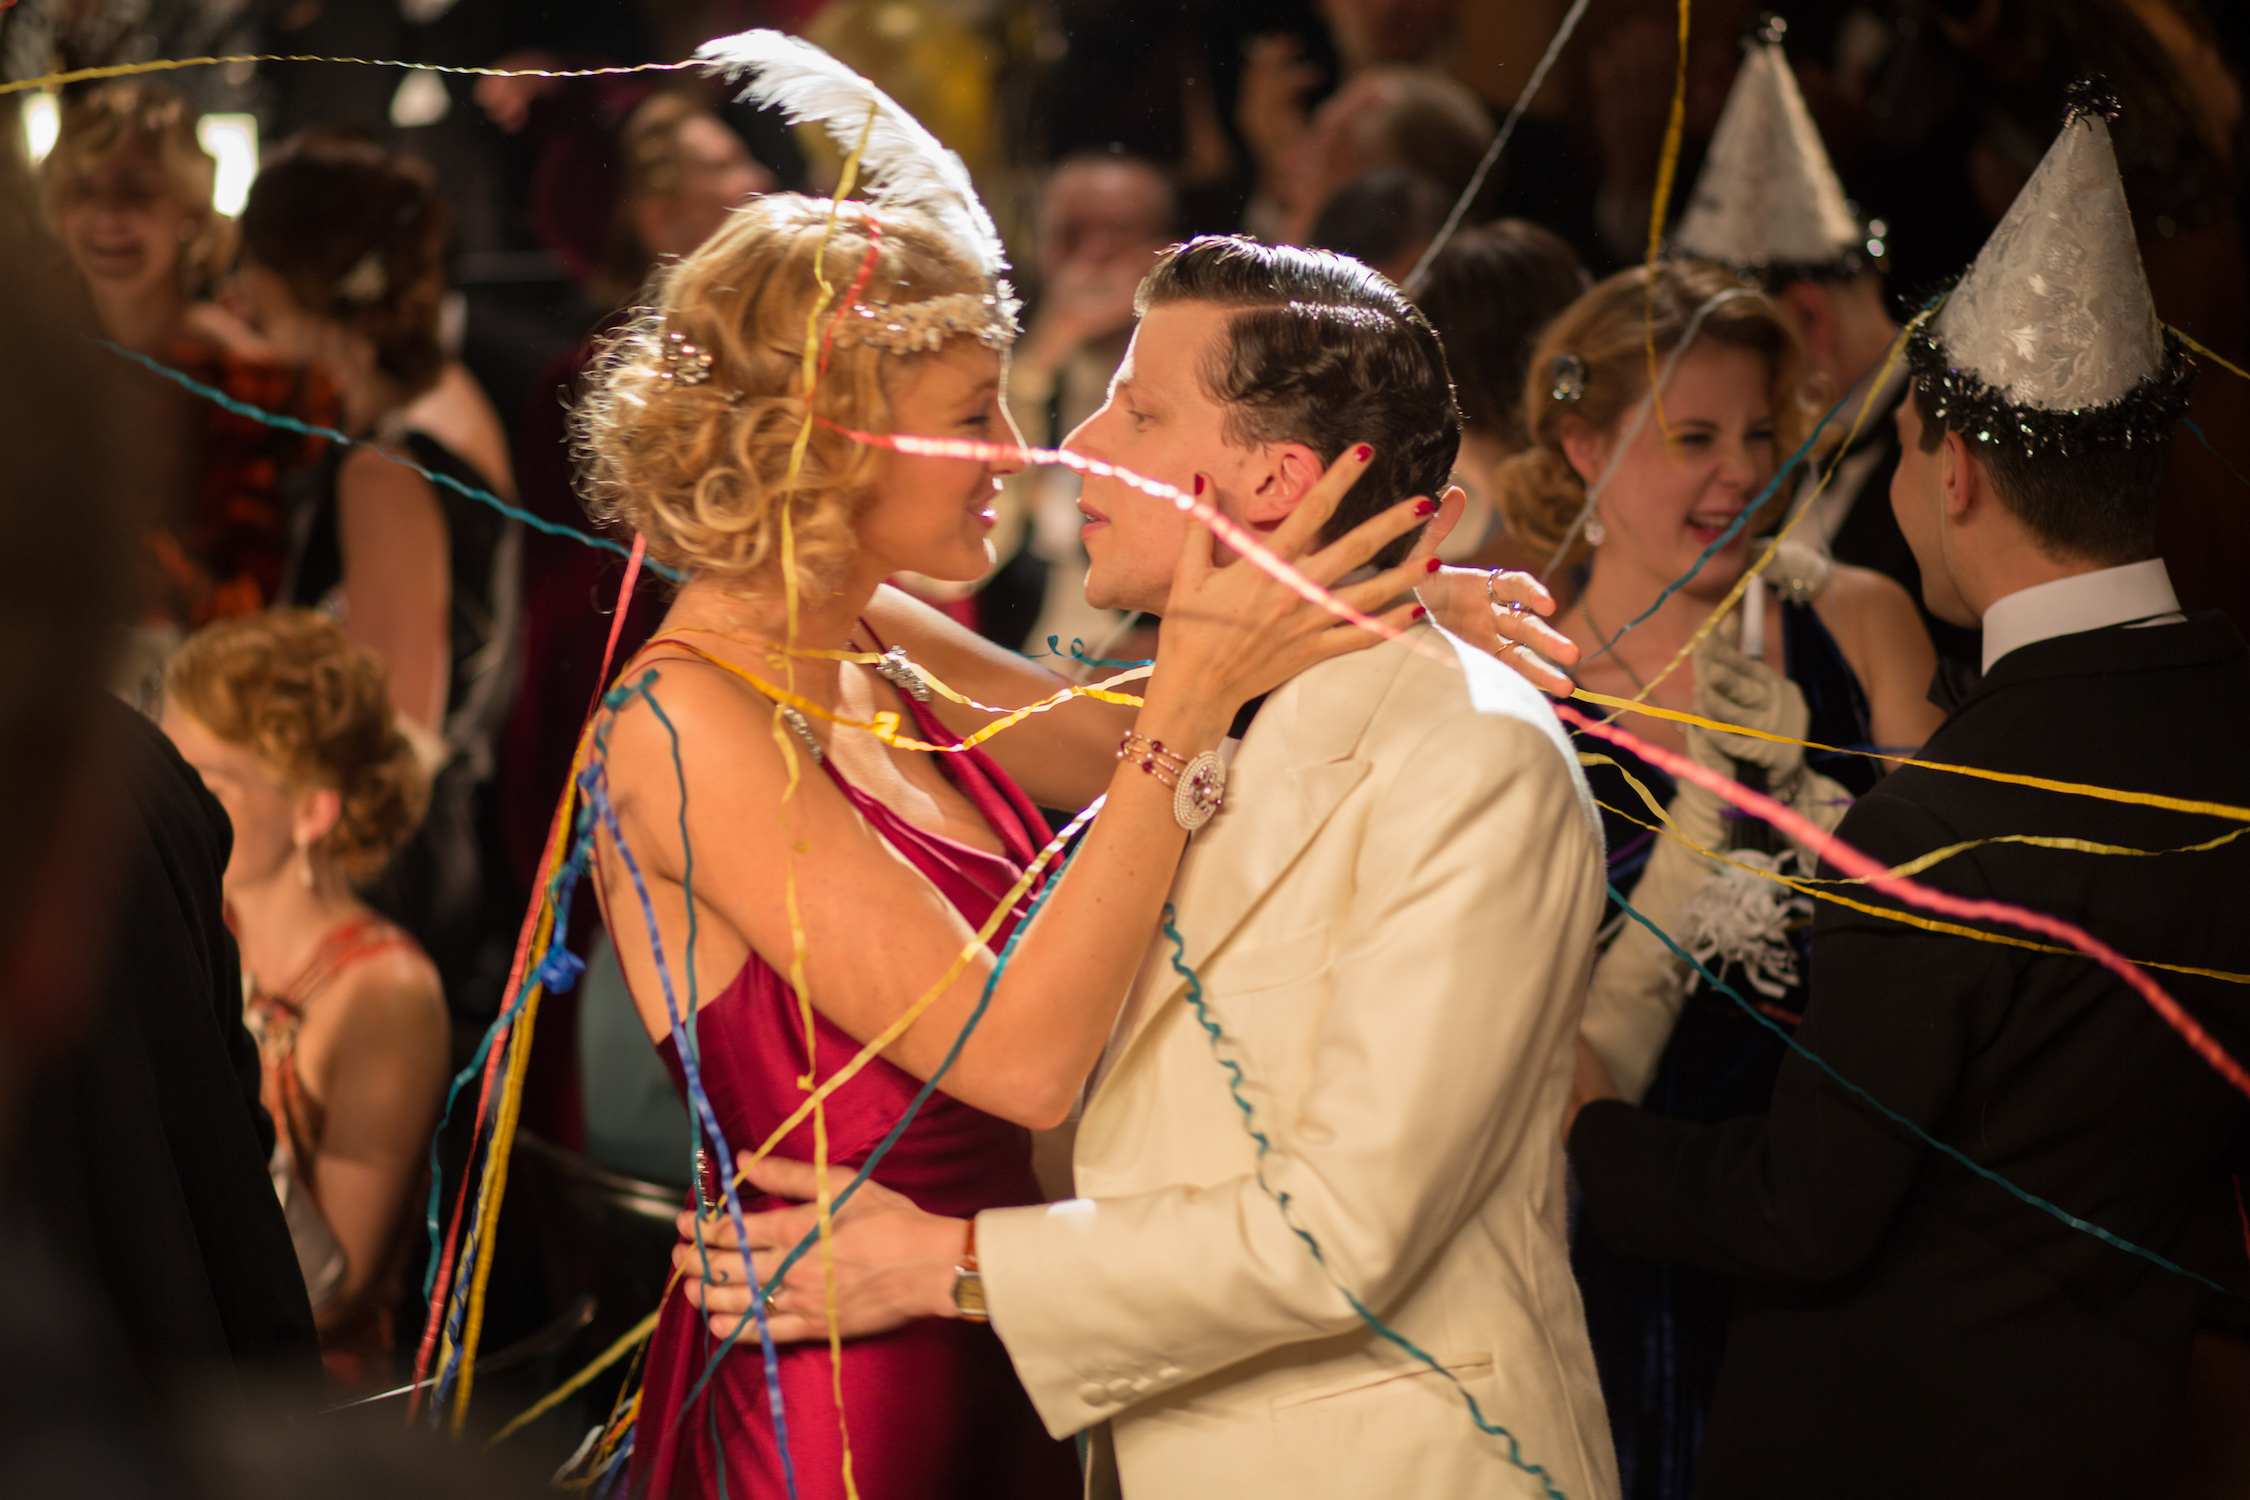 Blake Lively e Kristen Stewart a confronto in Café Society, foto